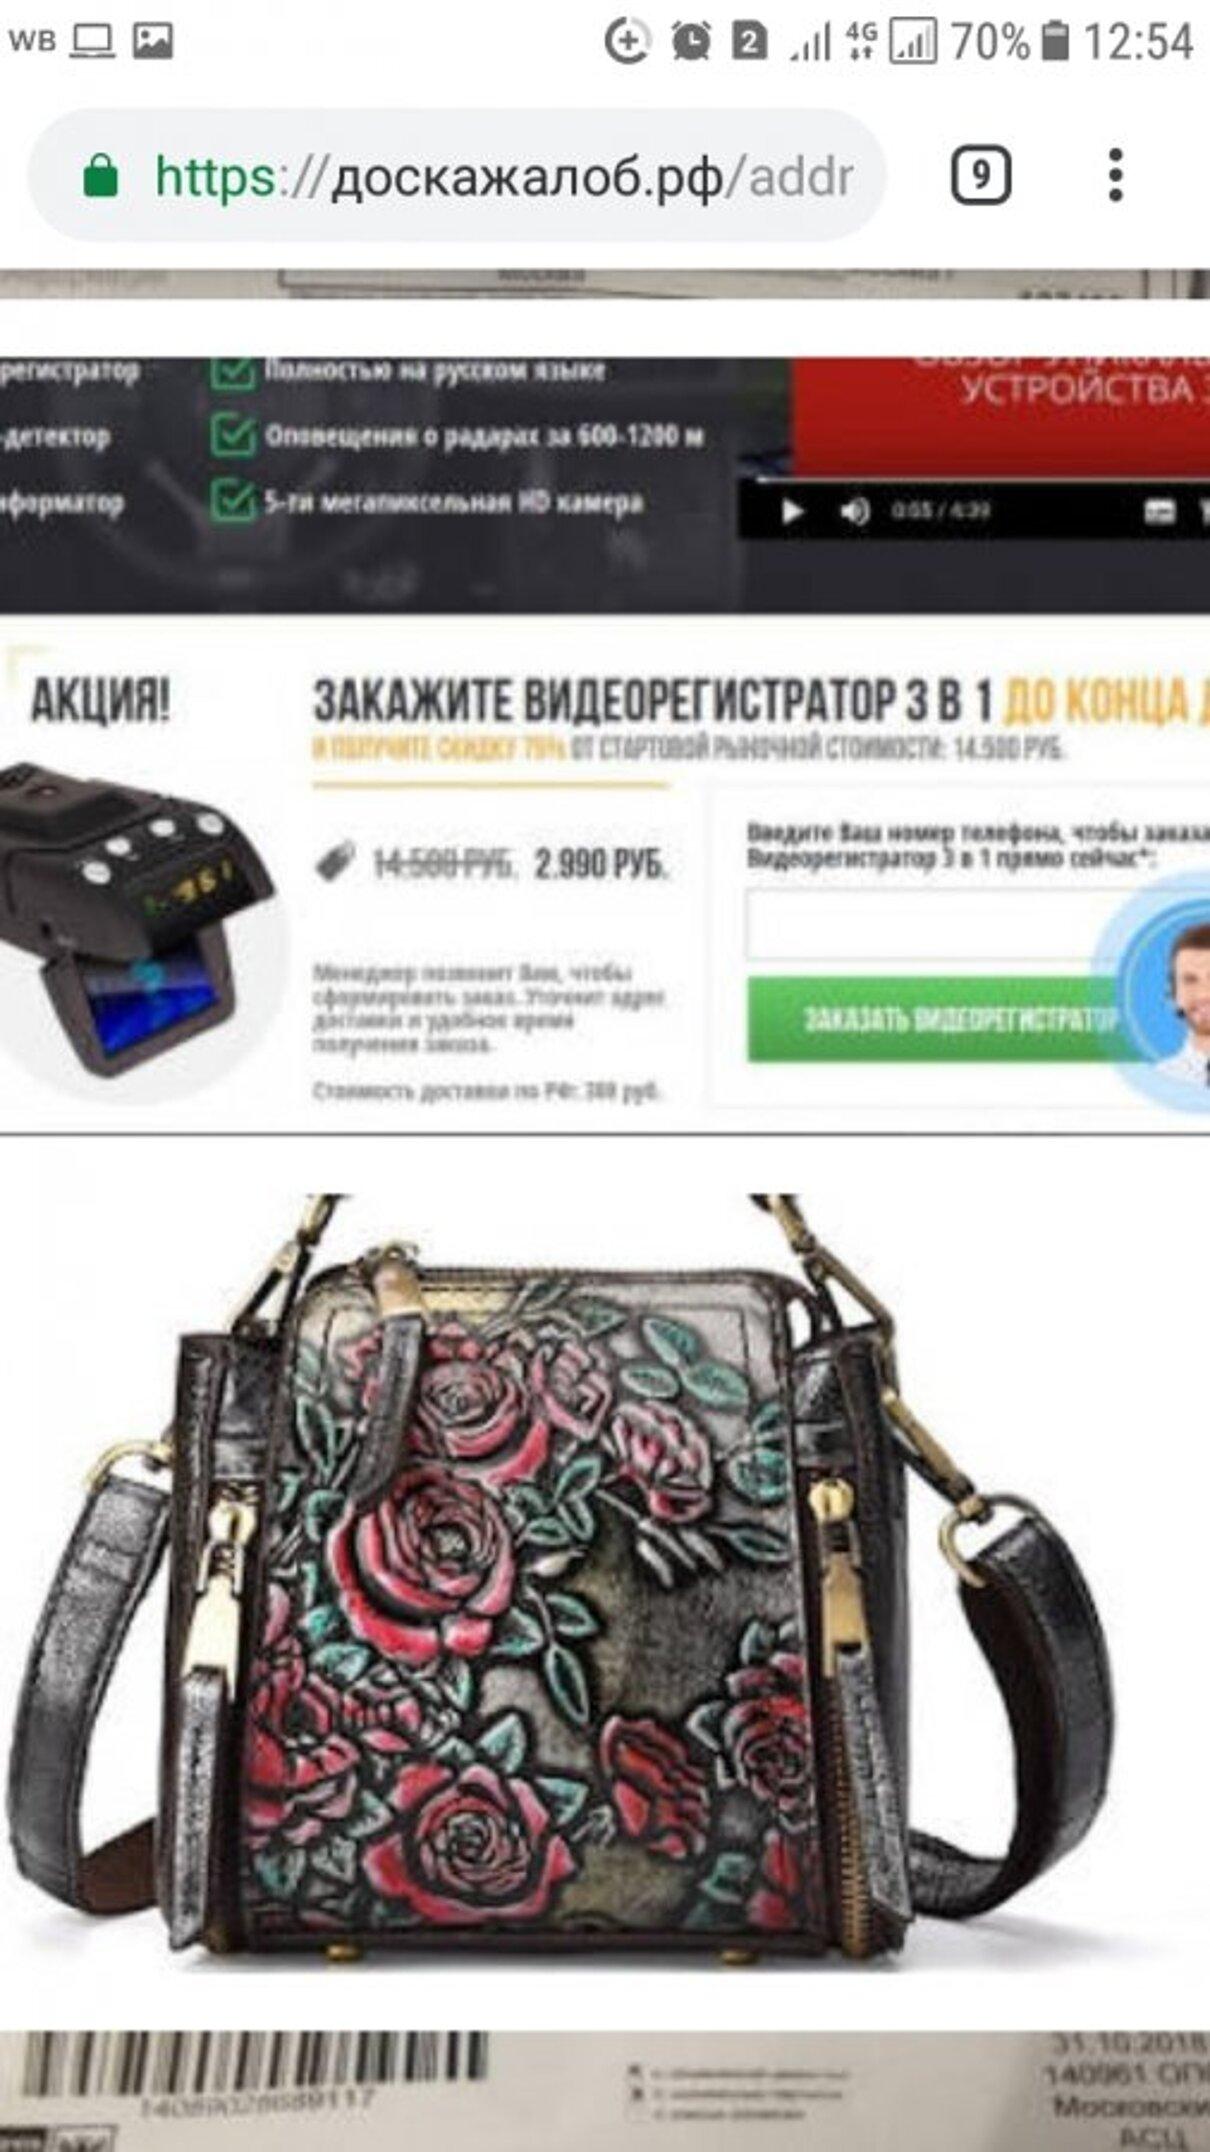 "Жалоба-отзыв: ООО ""ВЕНЕРА"" - Покупка сумки"